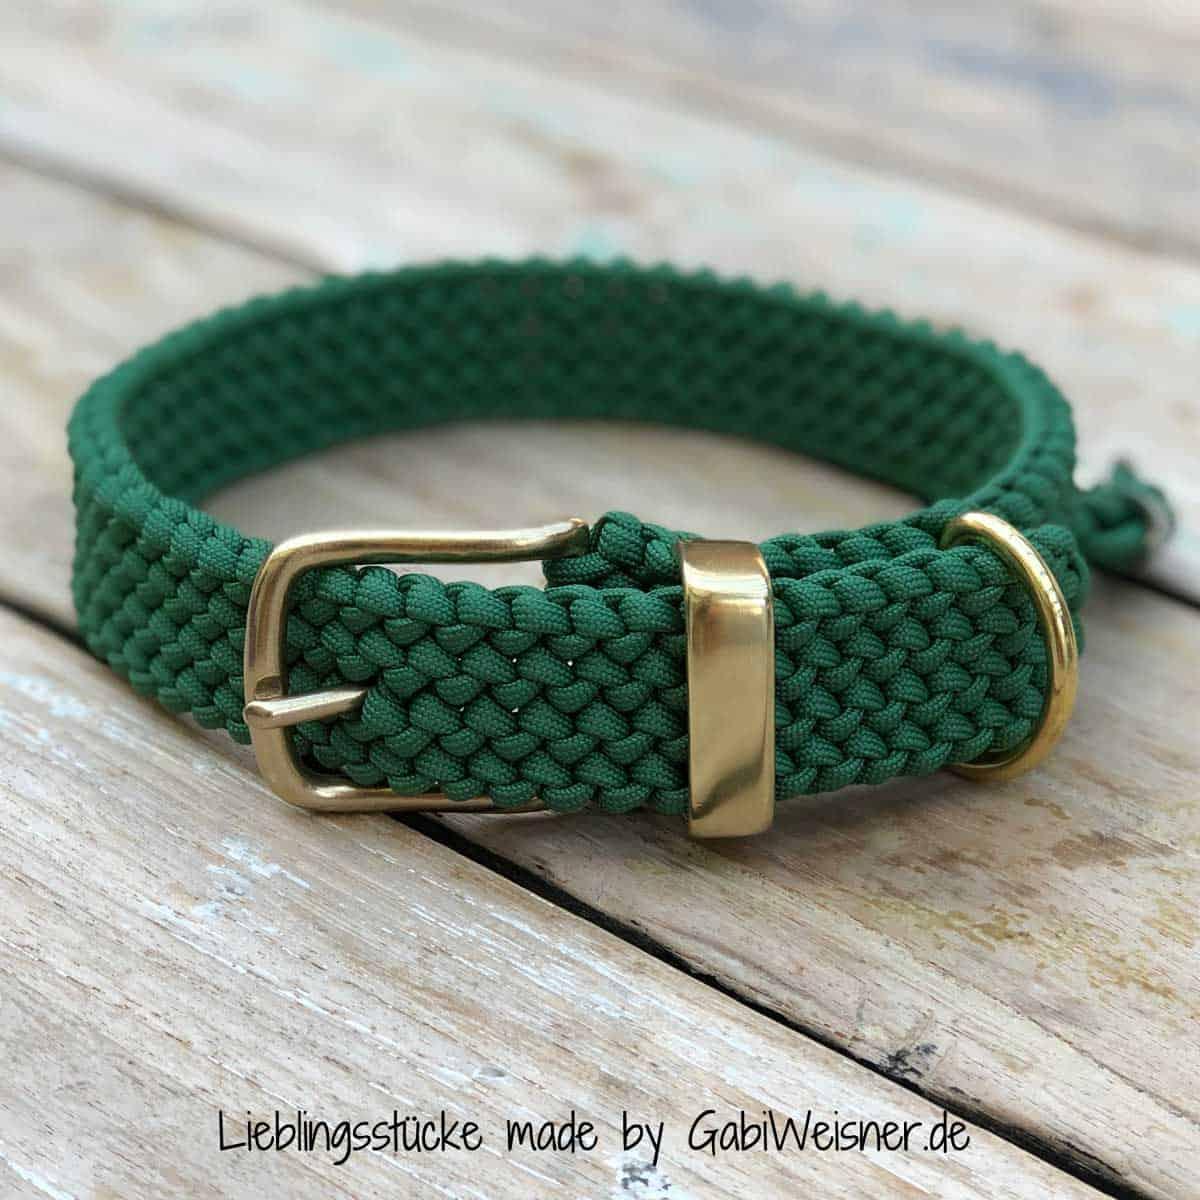 Hundehalsband Paracord Grün 3 cm breit stufenlos verstellbar